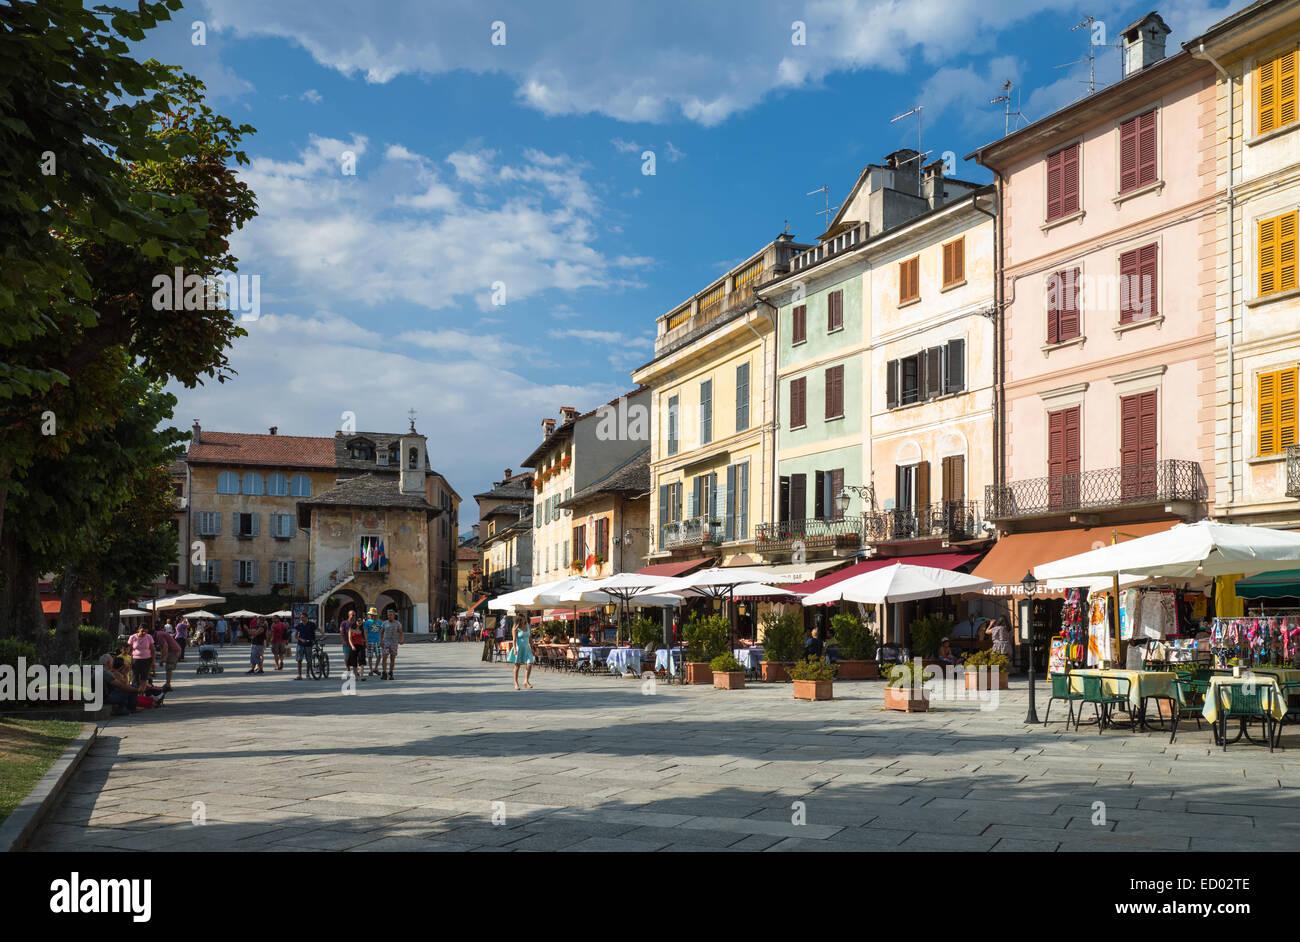 Italy, Piedmont, Lake Orta, Orta San Giulio, people in Motta square - Stock Image